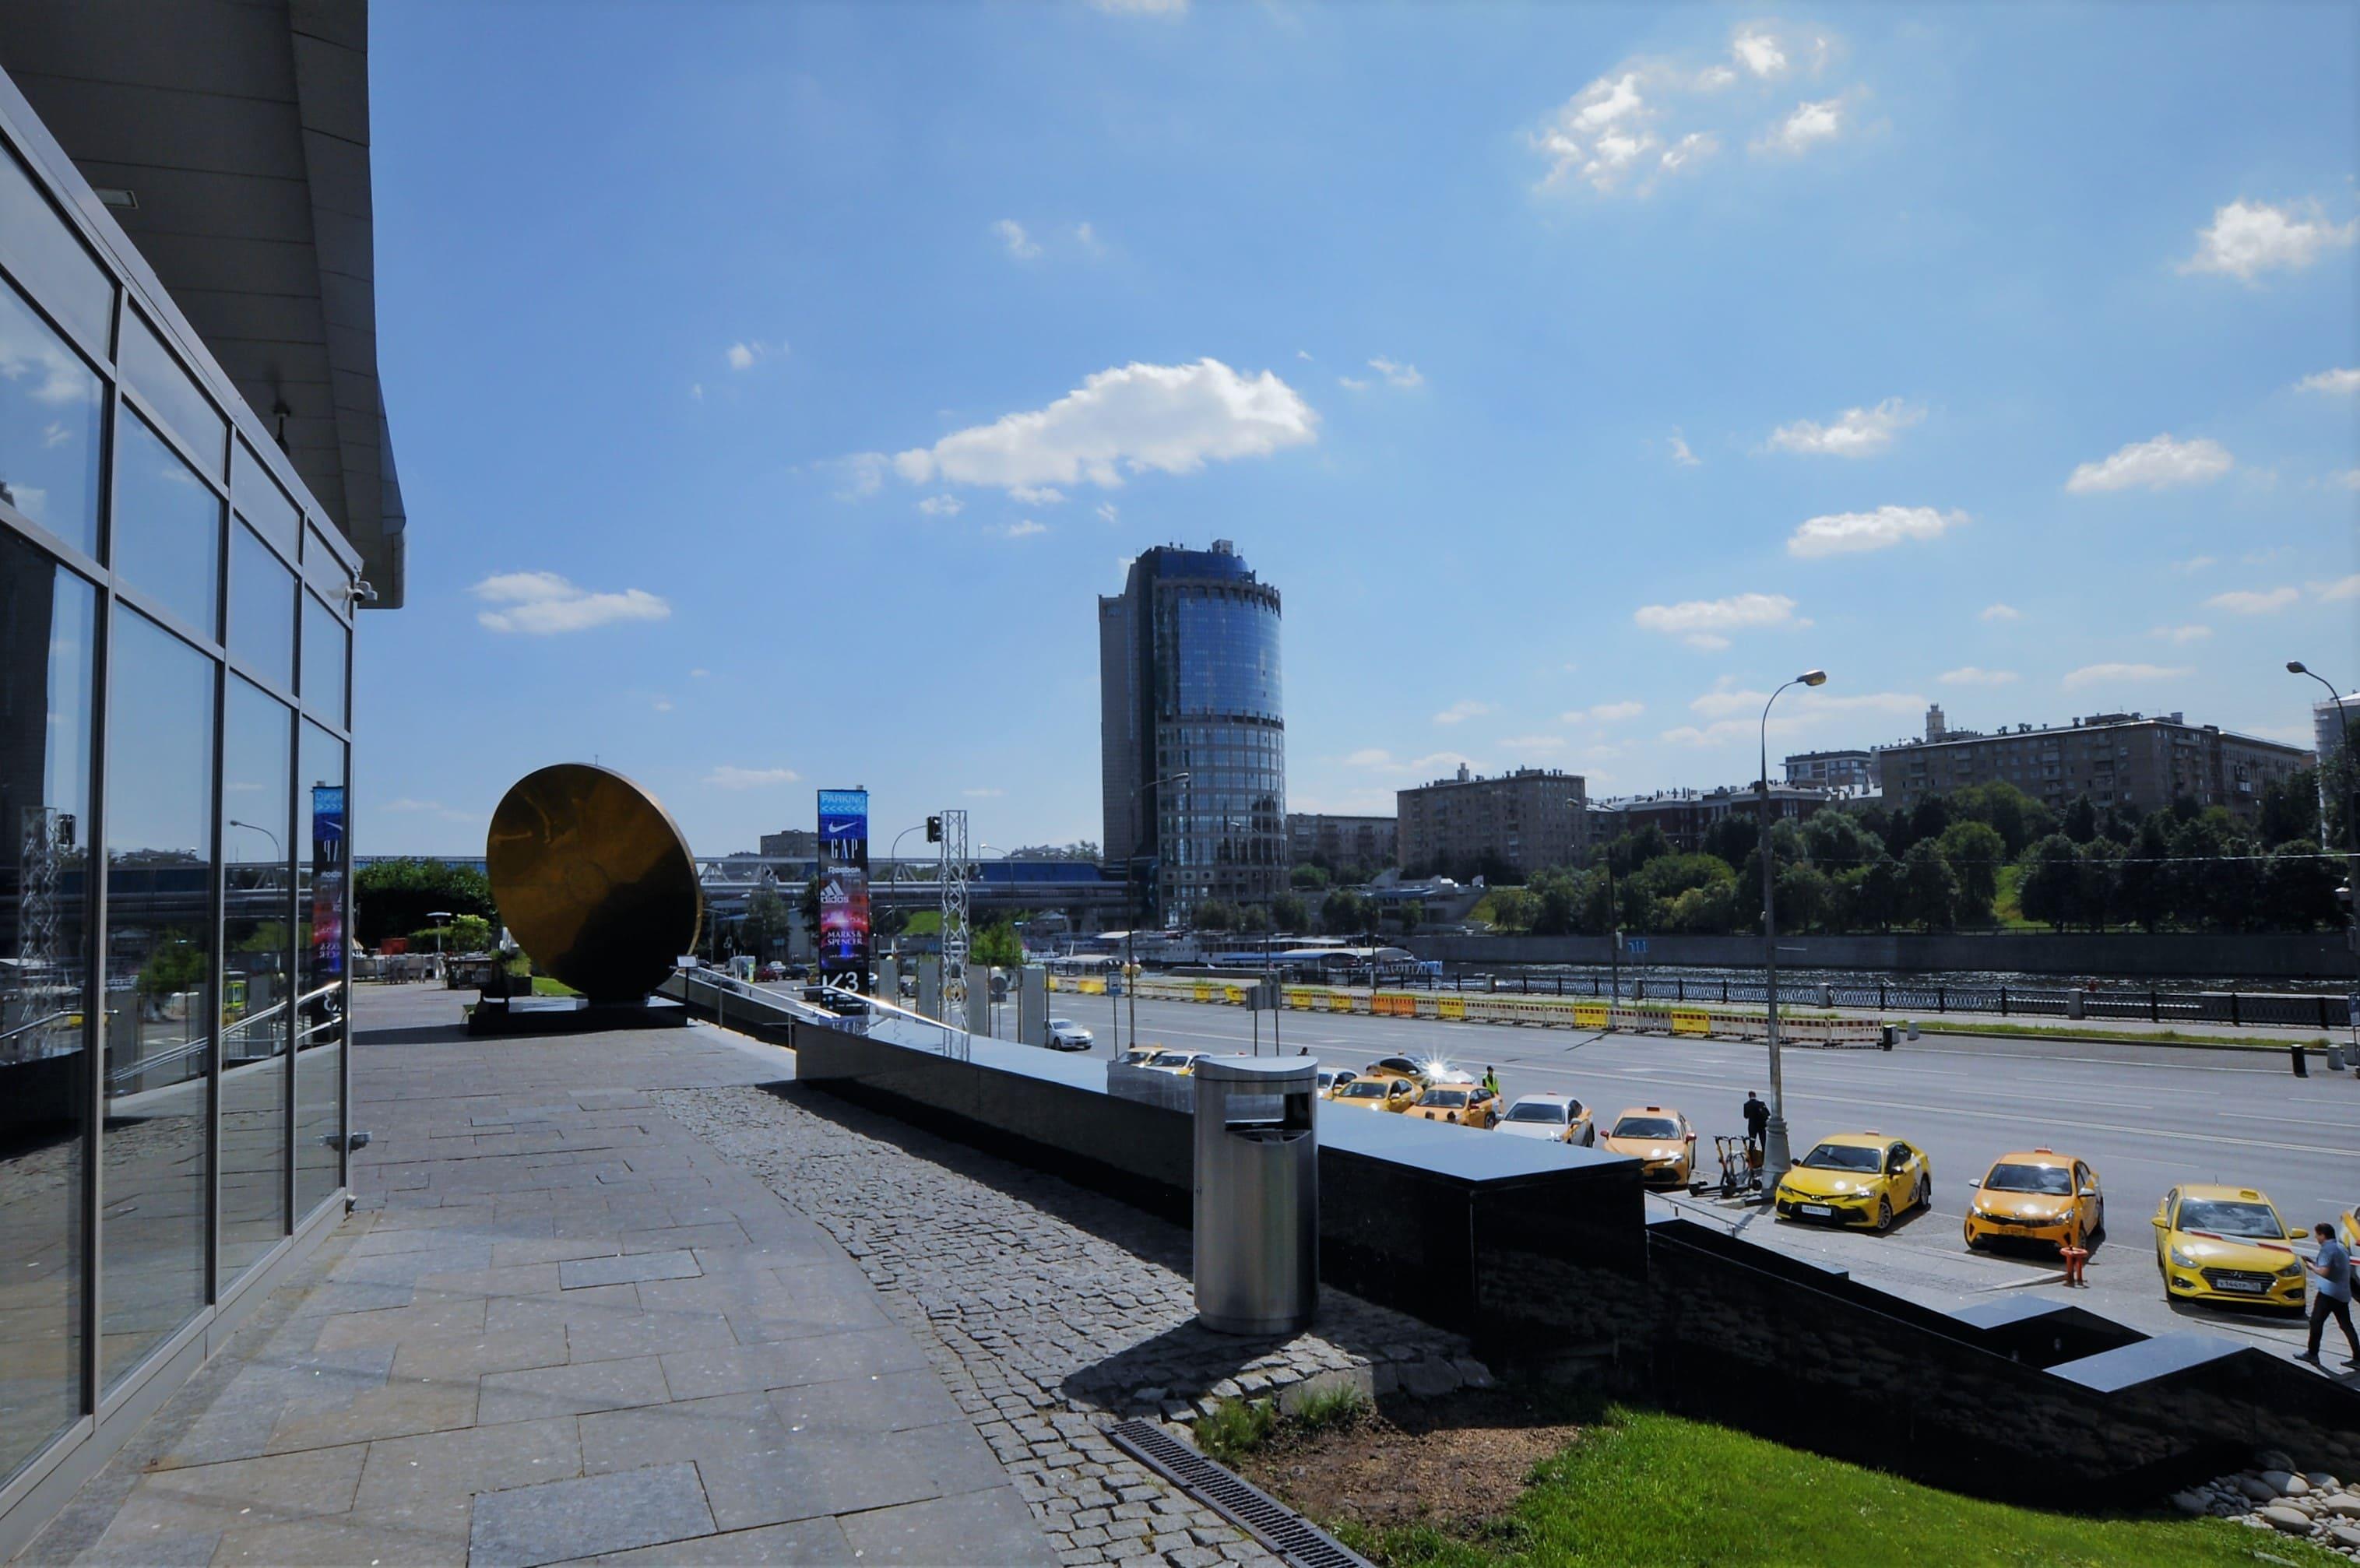 Аренда офисов Москва Сити башня 2000